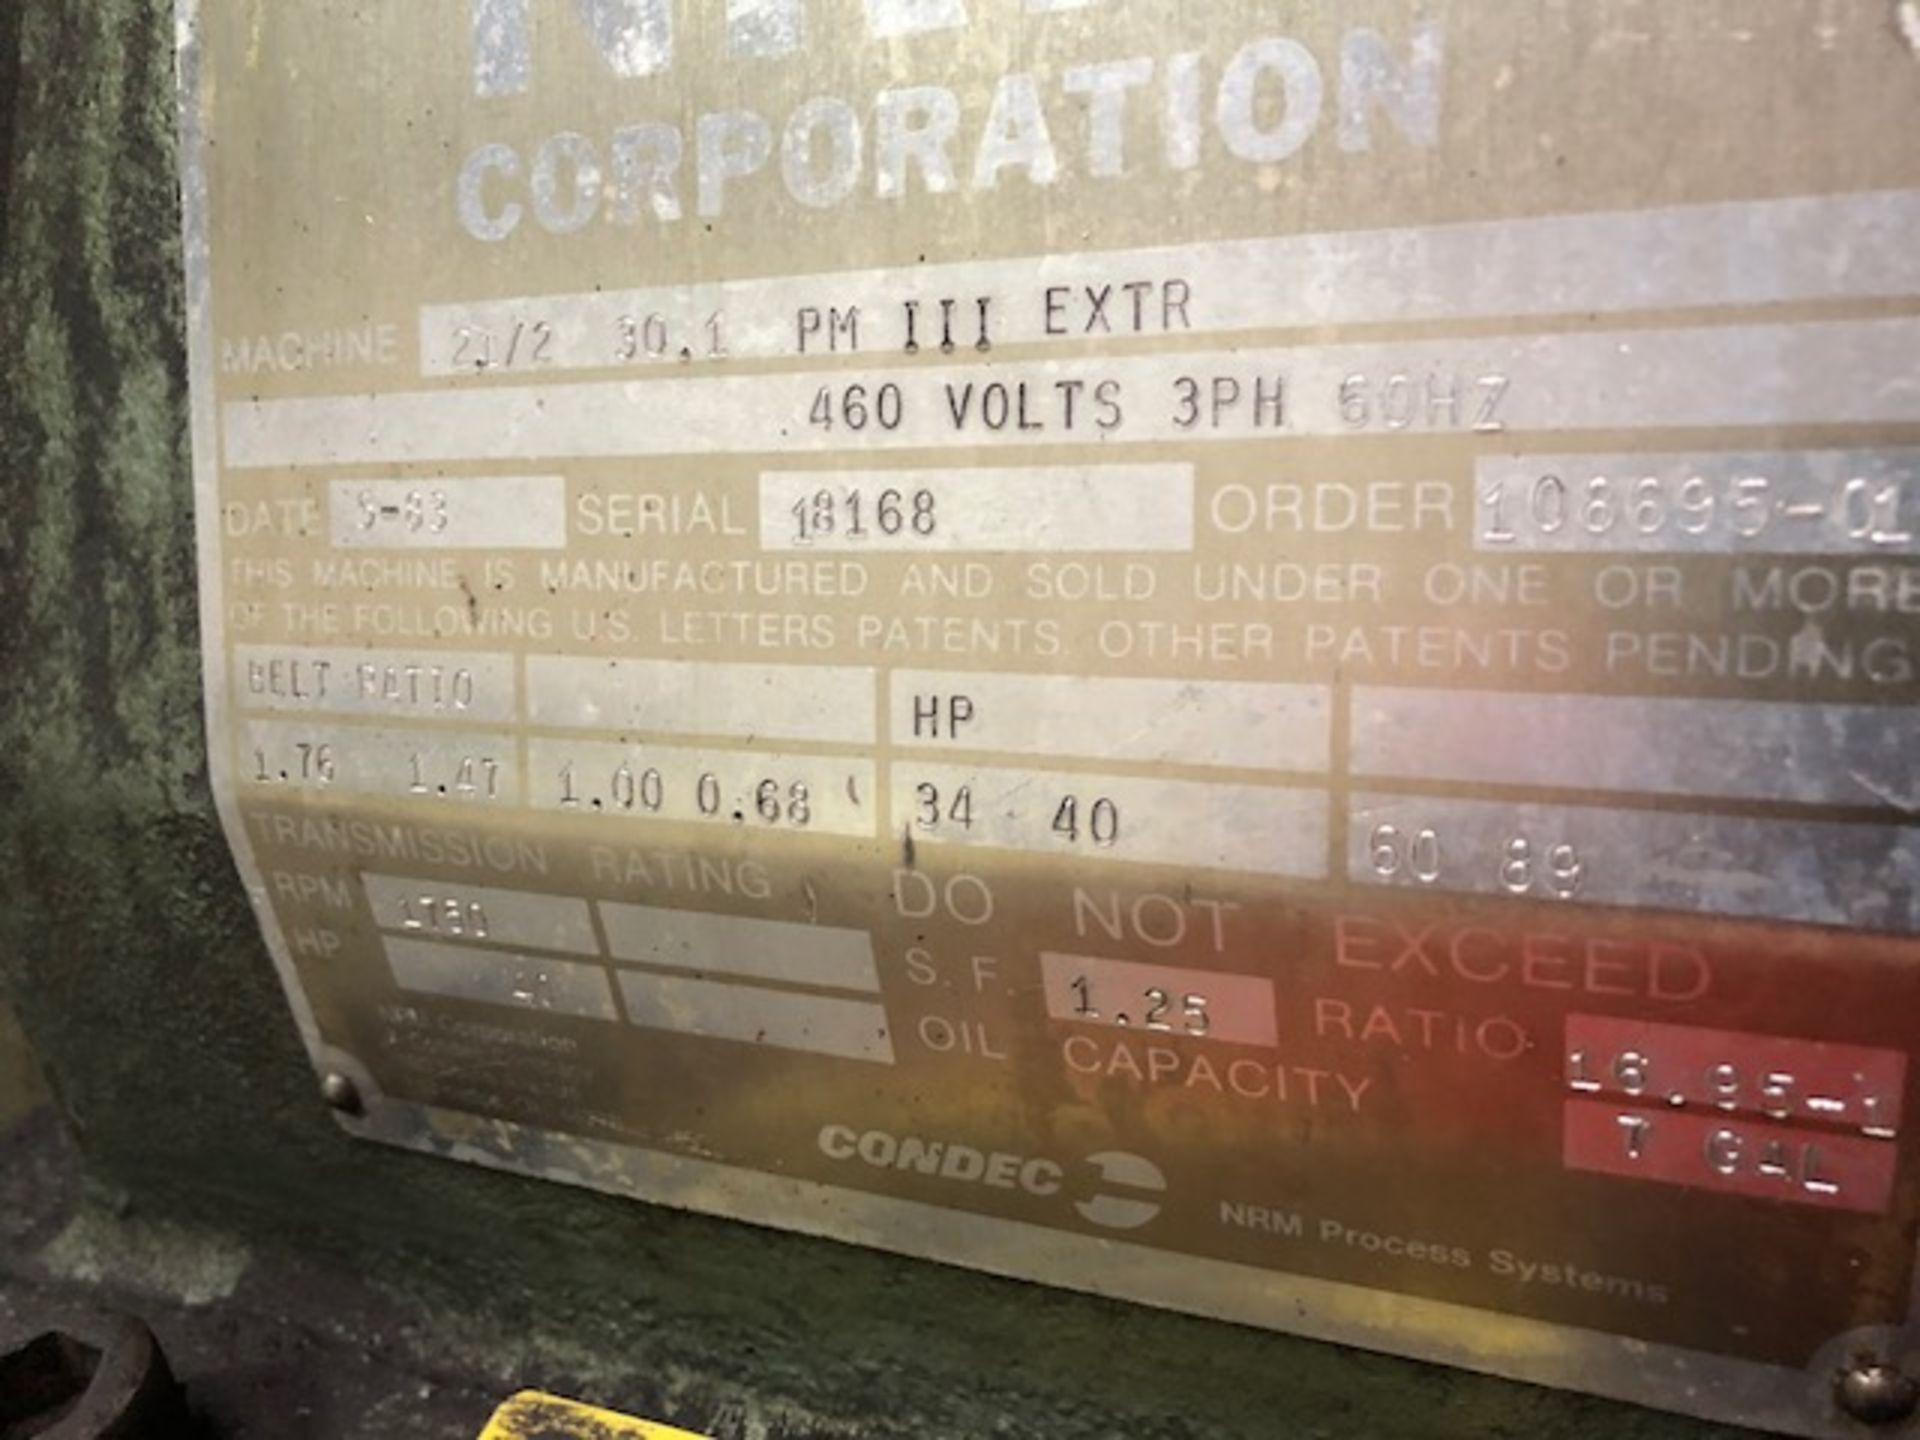 "Lot 108 - NRM 2.5"" - 30:1 PM III Extruder"